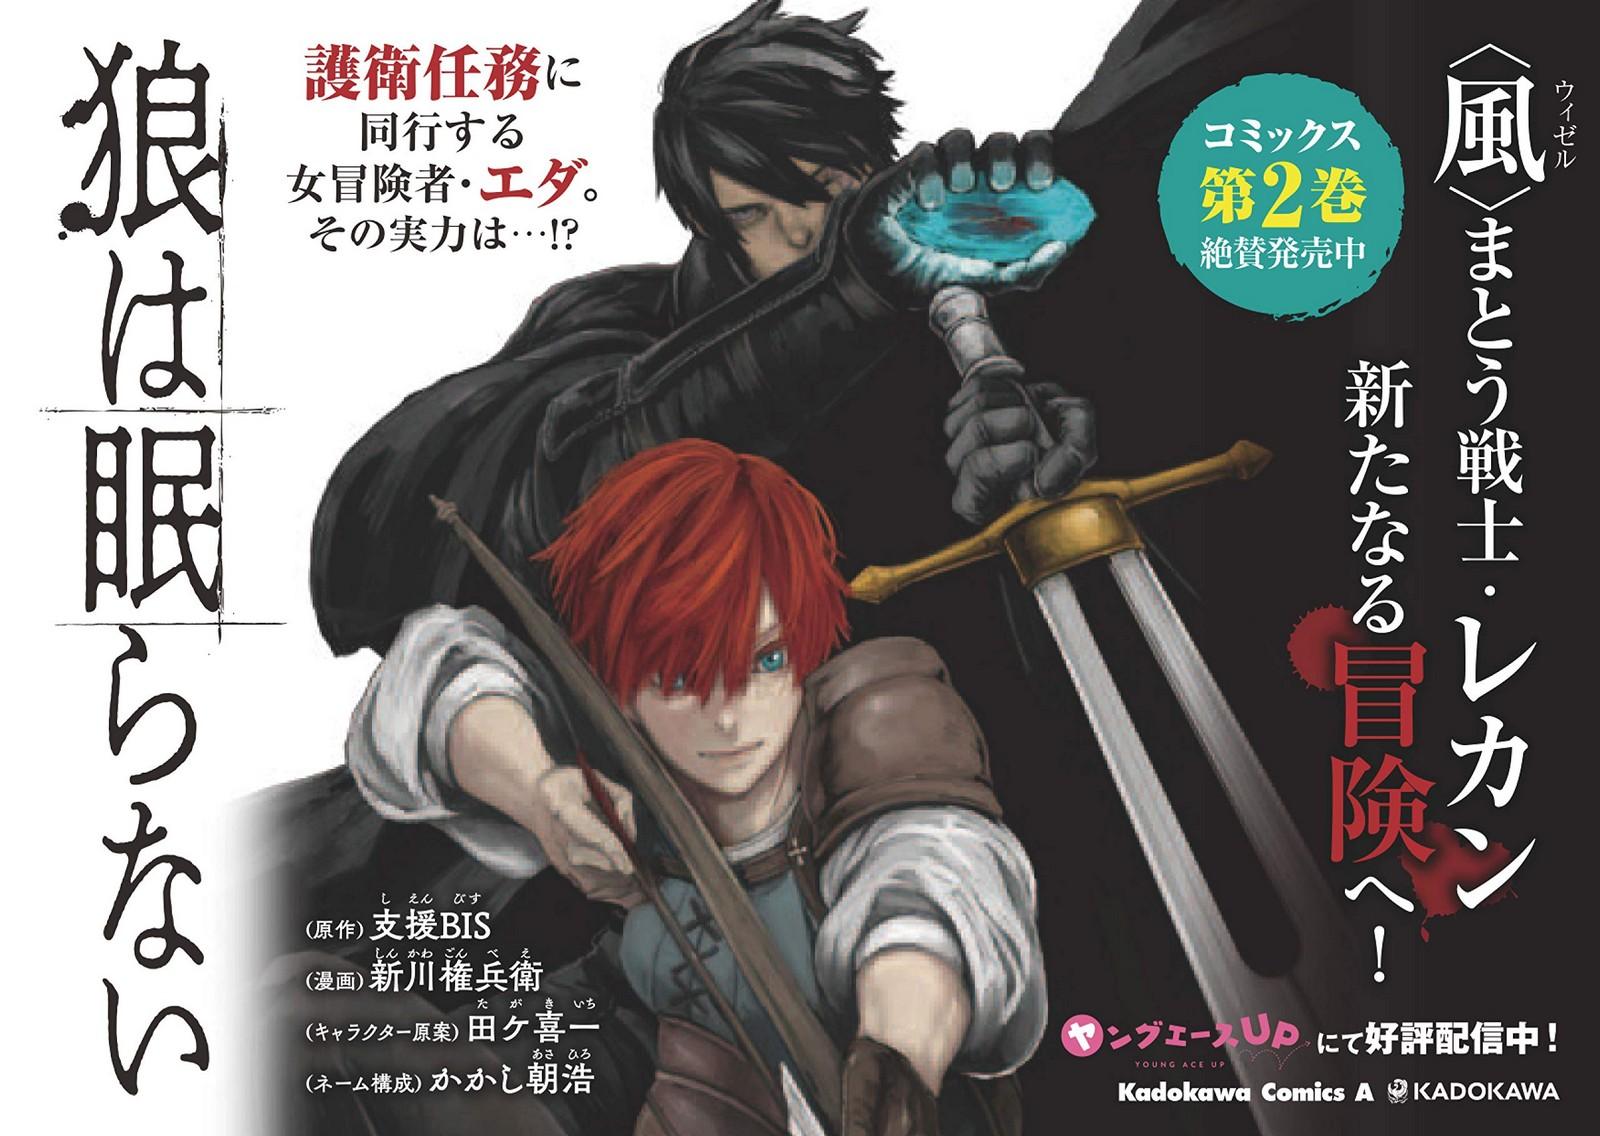 Planet Manga annuncia Star Wars - Le leggende di Luke